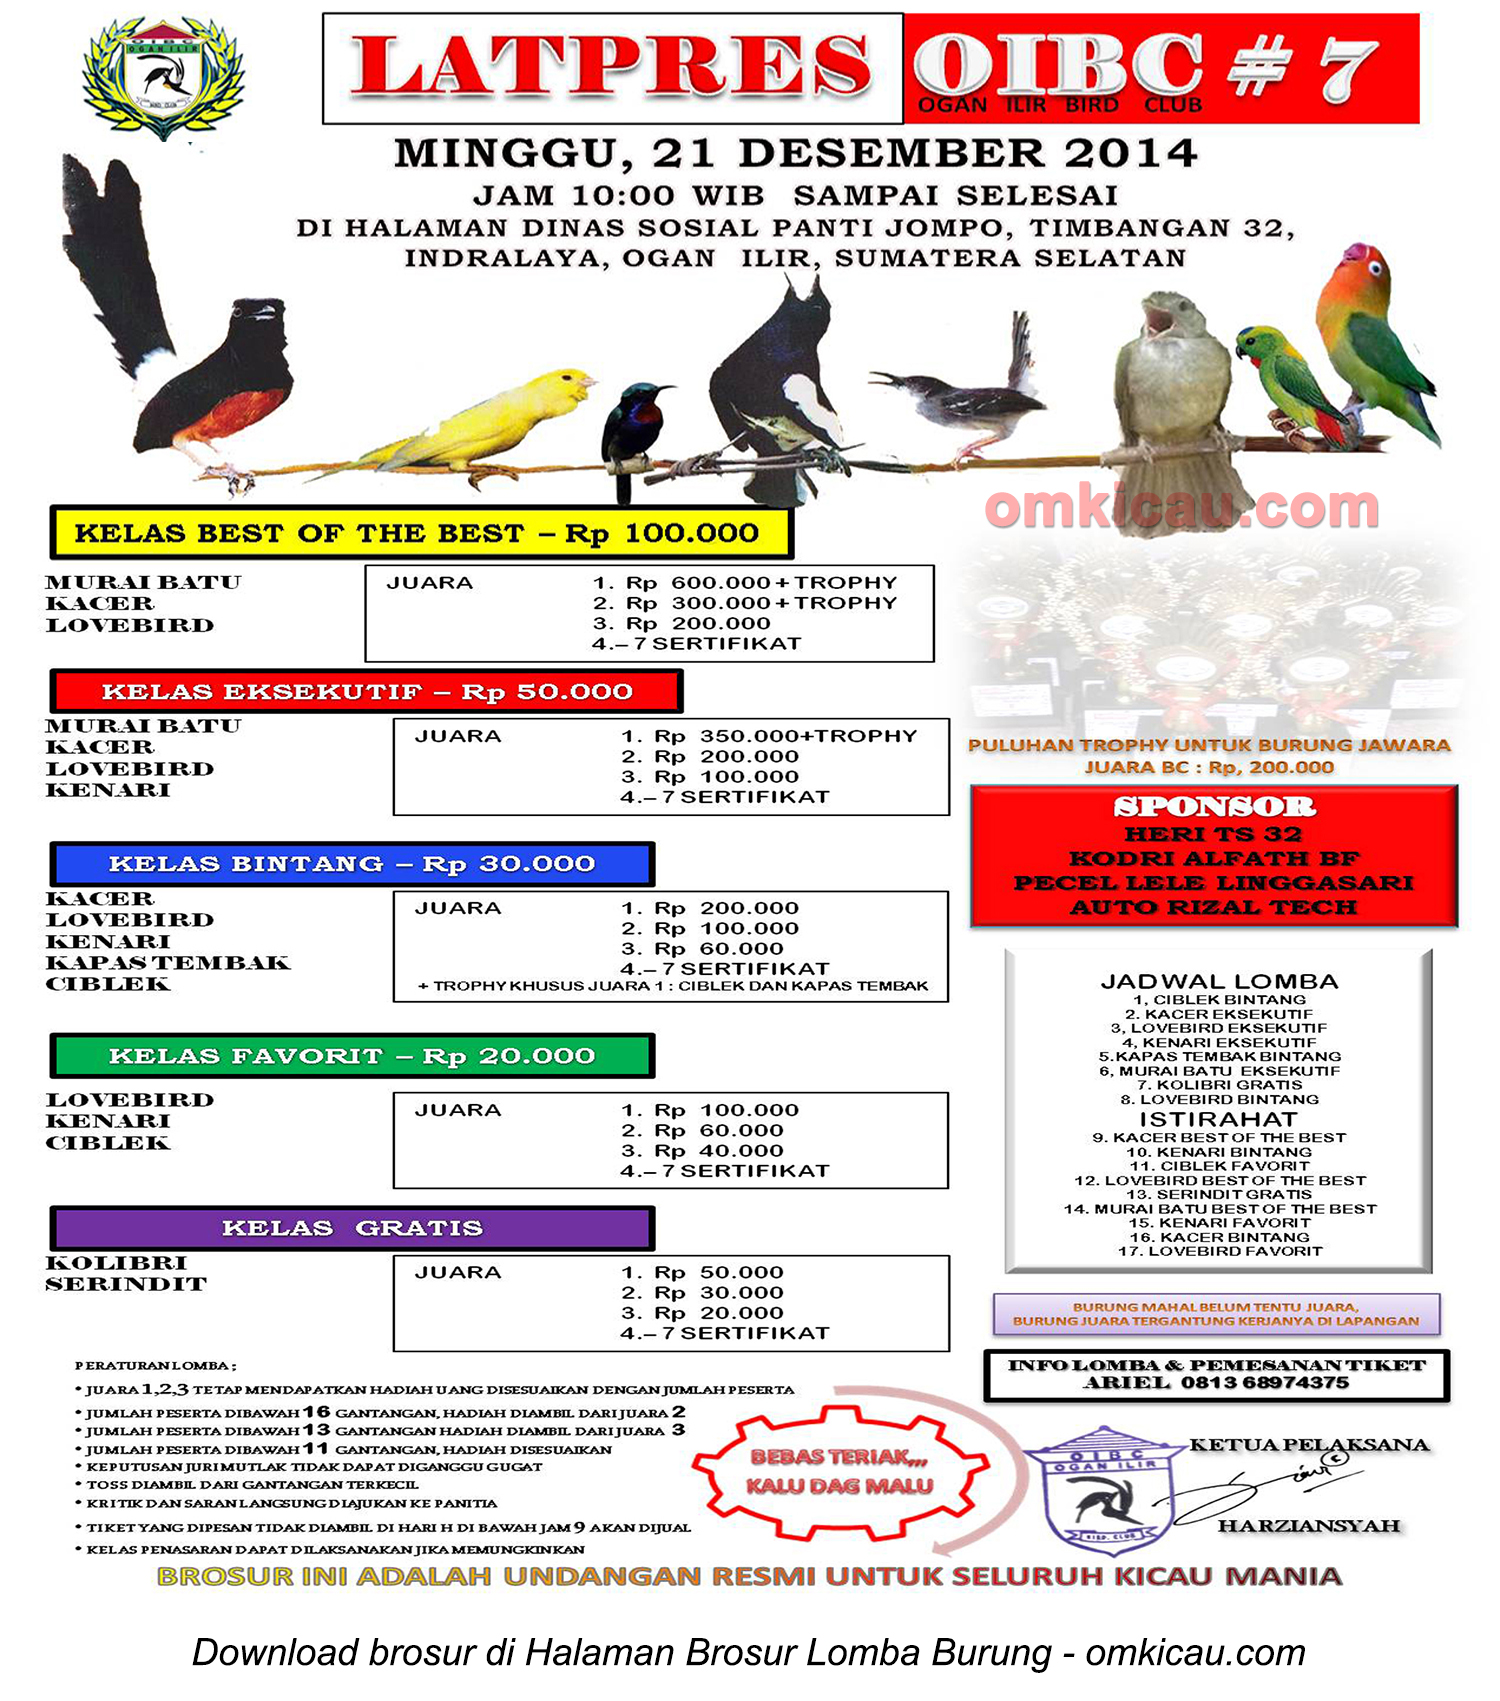 Brosur Latpres Burung Berkicau OIBC #7, Ogan Ilir, 21 Desember 2014